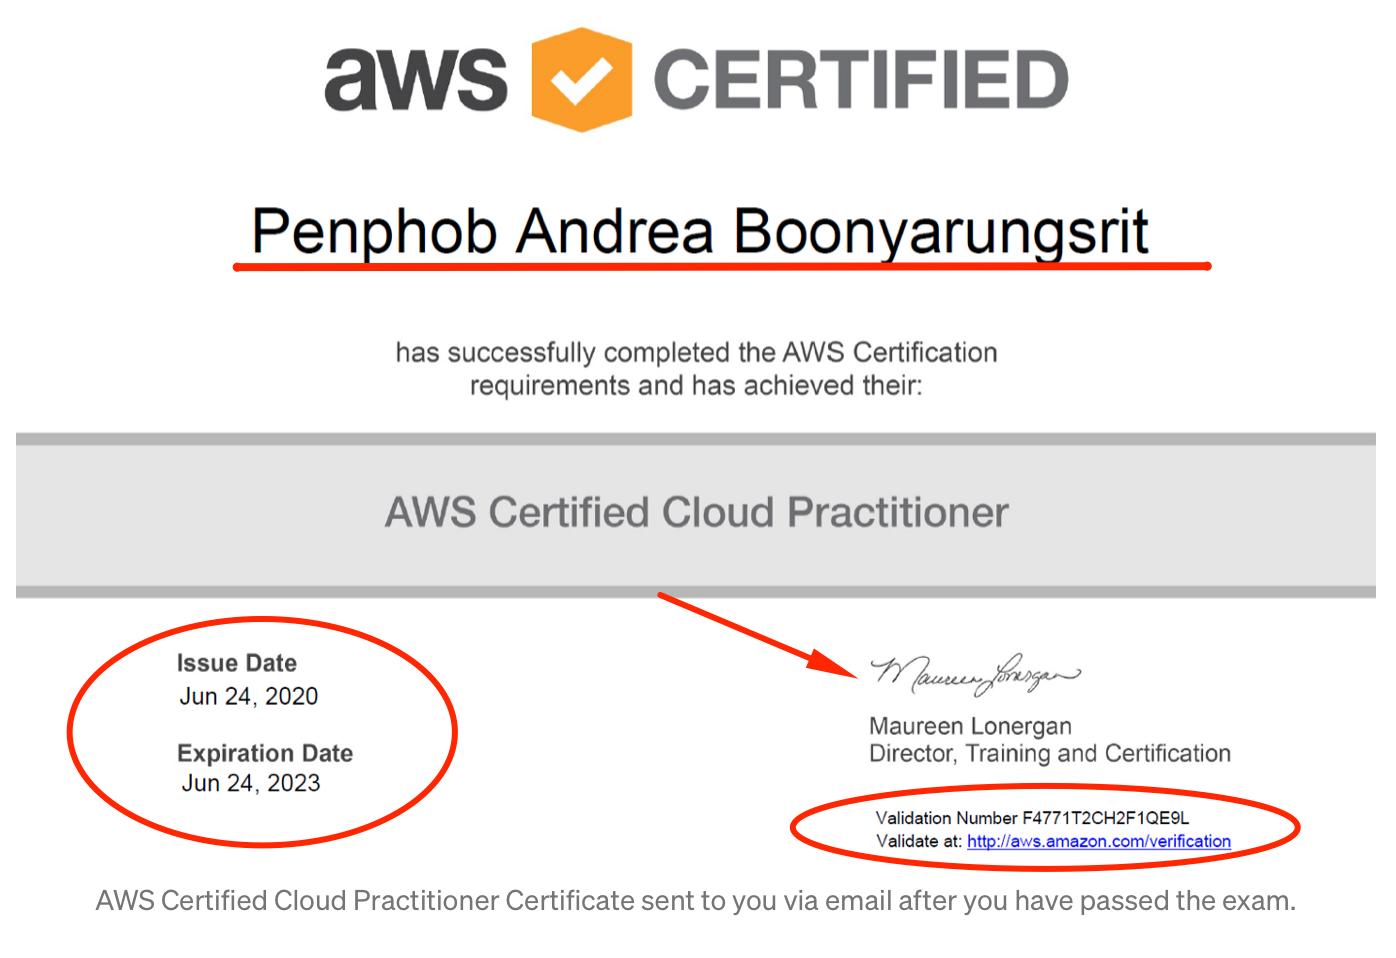 AWS Certificate design